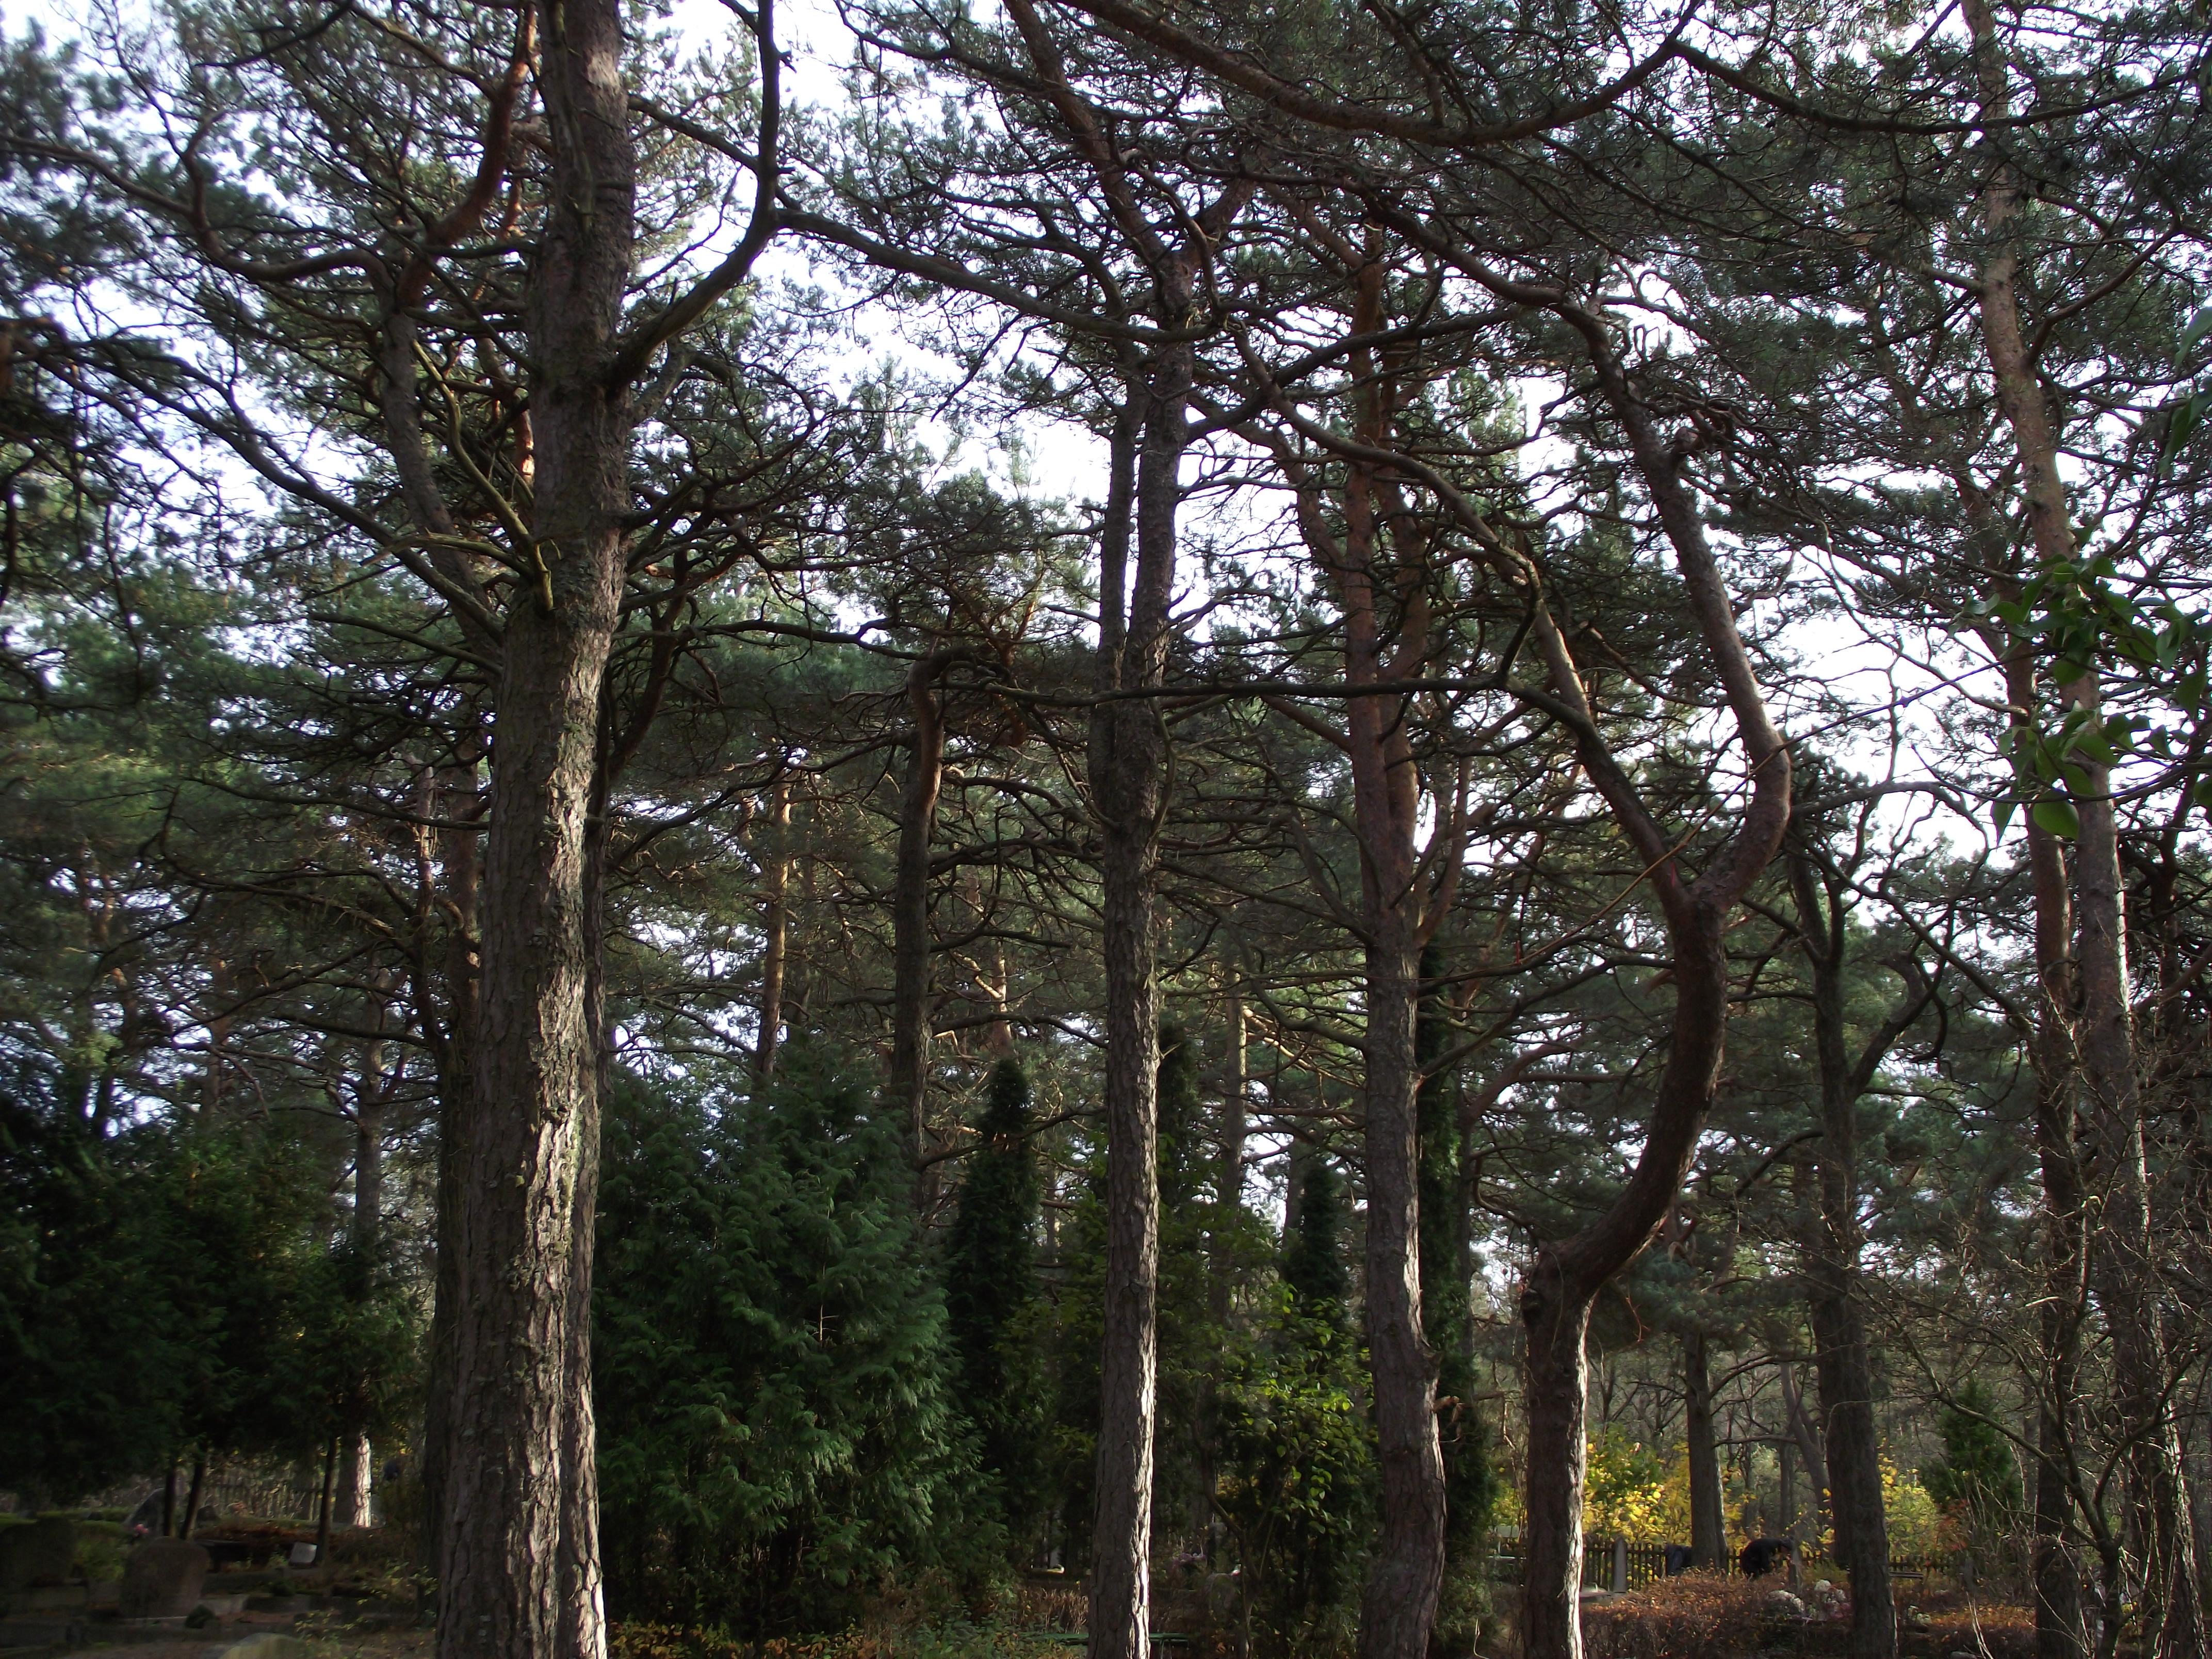 Graveyard pines, Autumn, Graveyard, Nature, Pine, HQ Photo